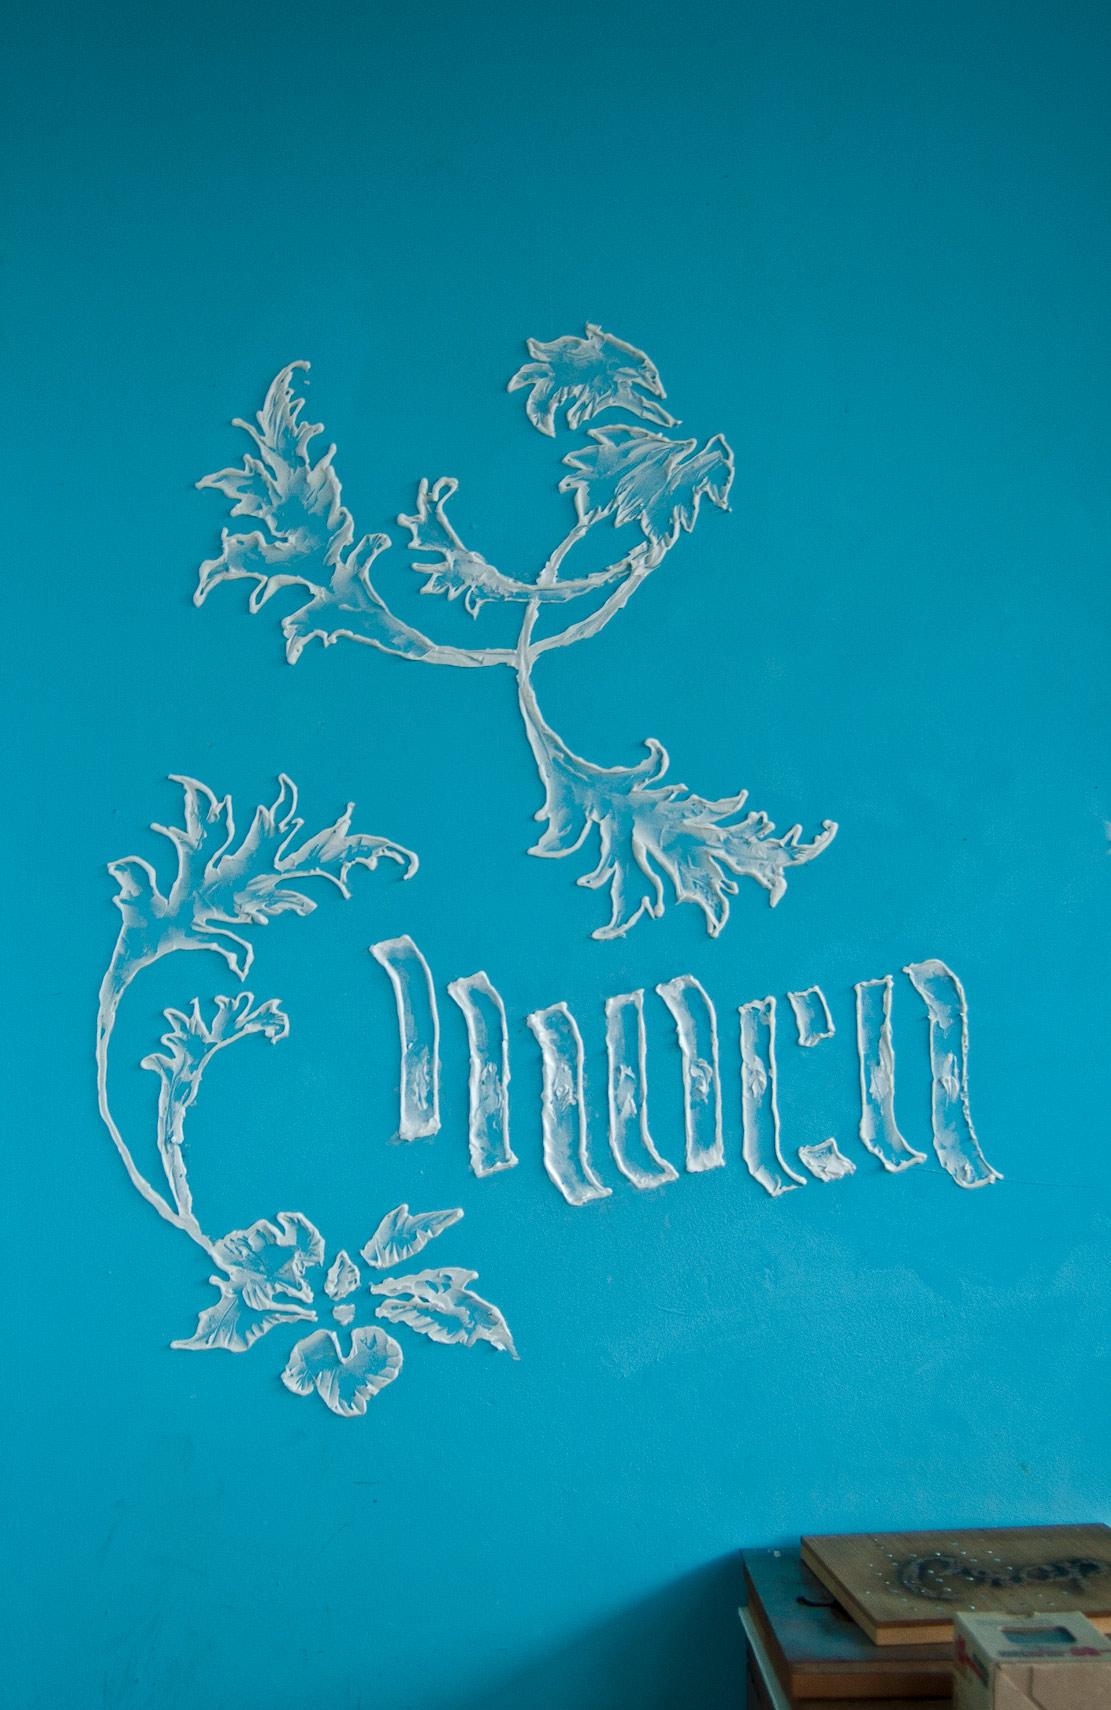 handmade graphics, artwork, acrylic, lettering